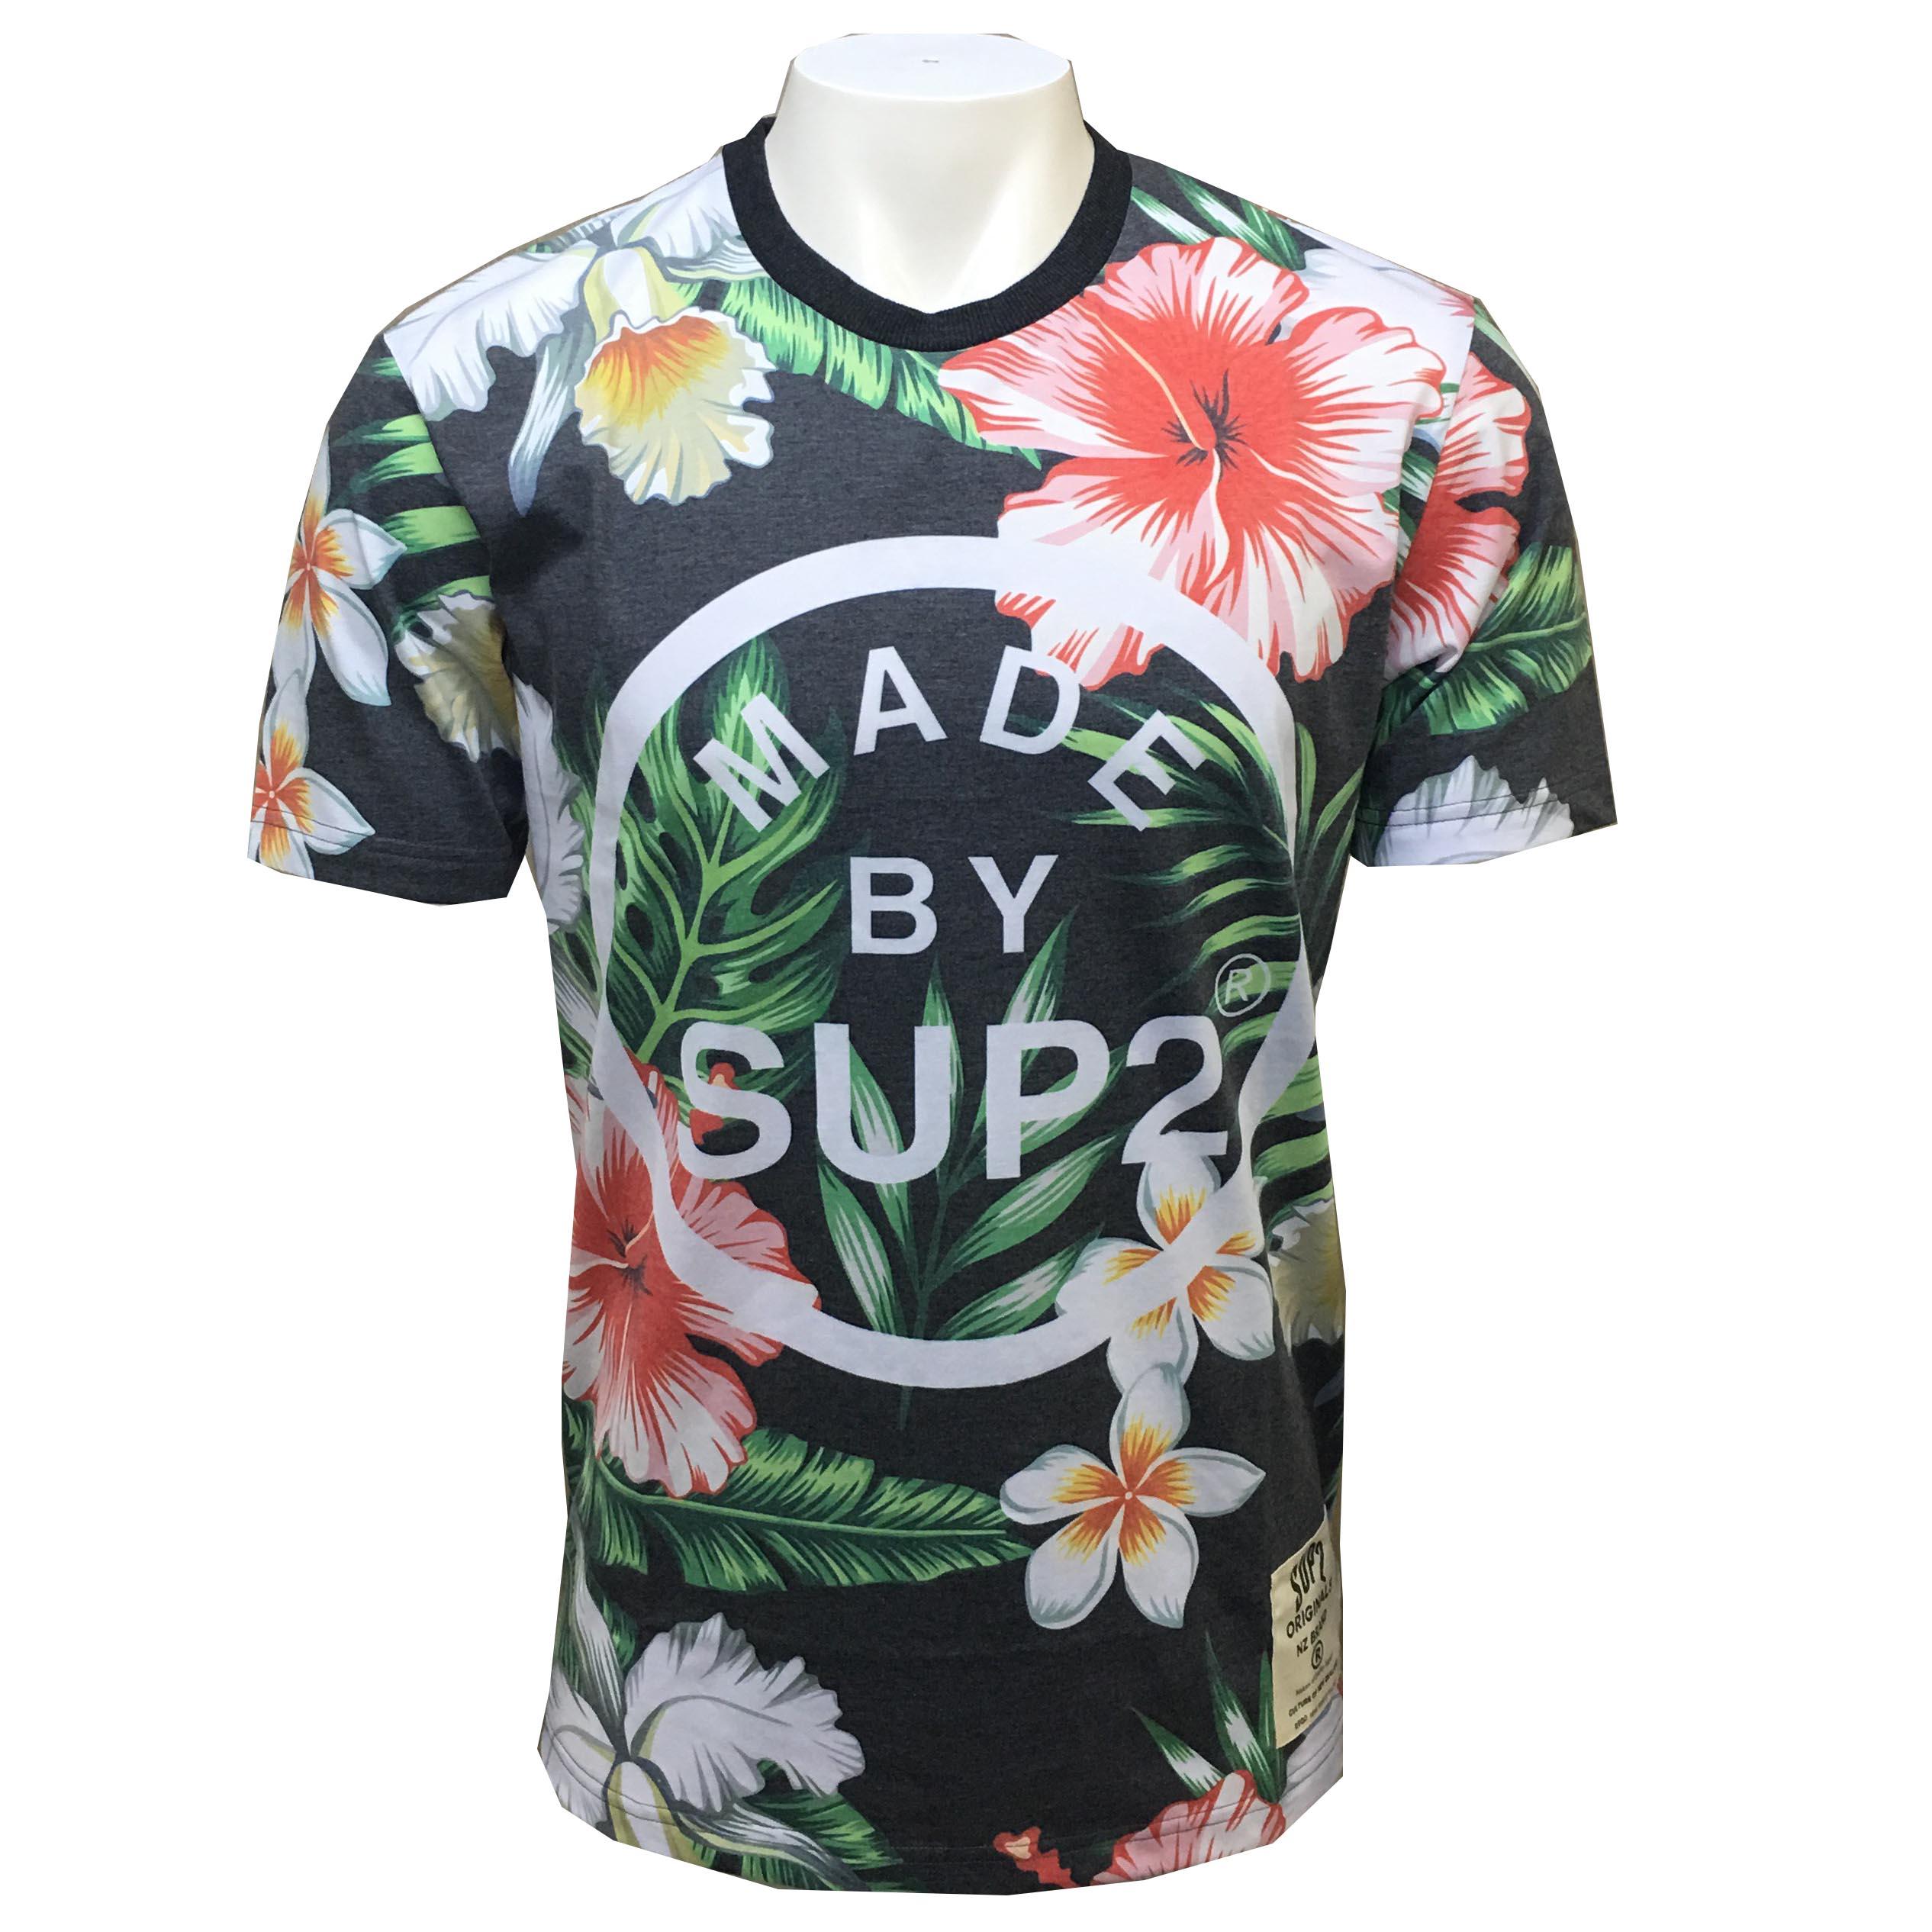 SUP2 PREMIUM Tシャツ DAFFODIL